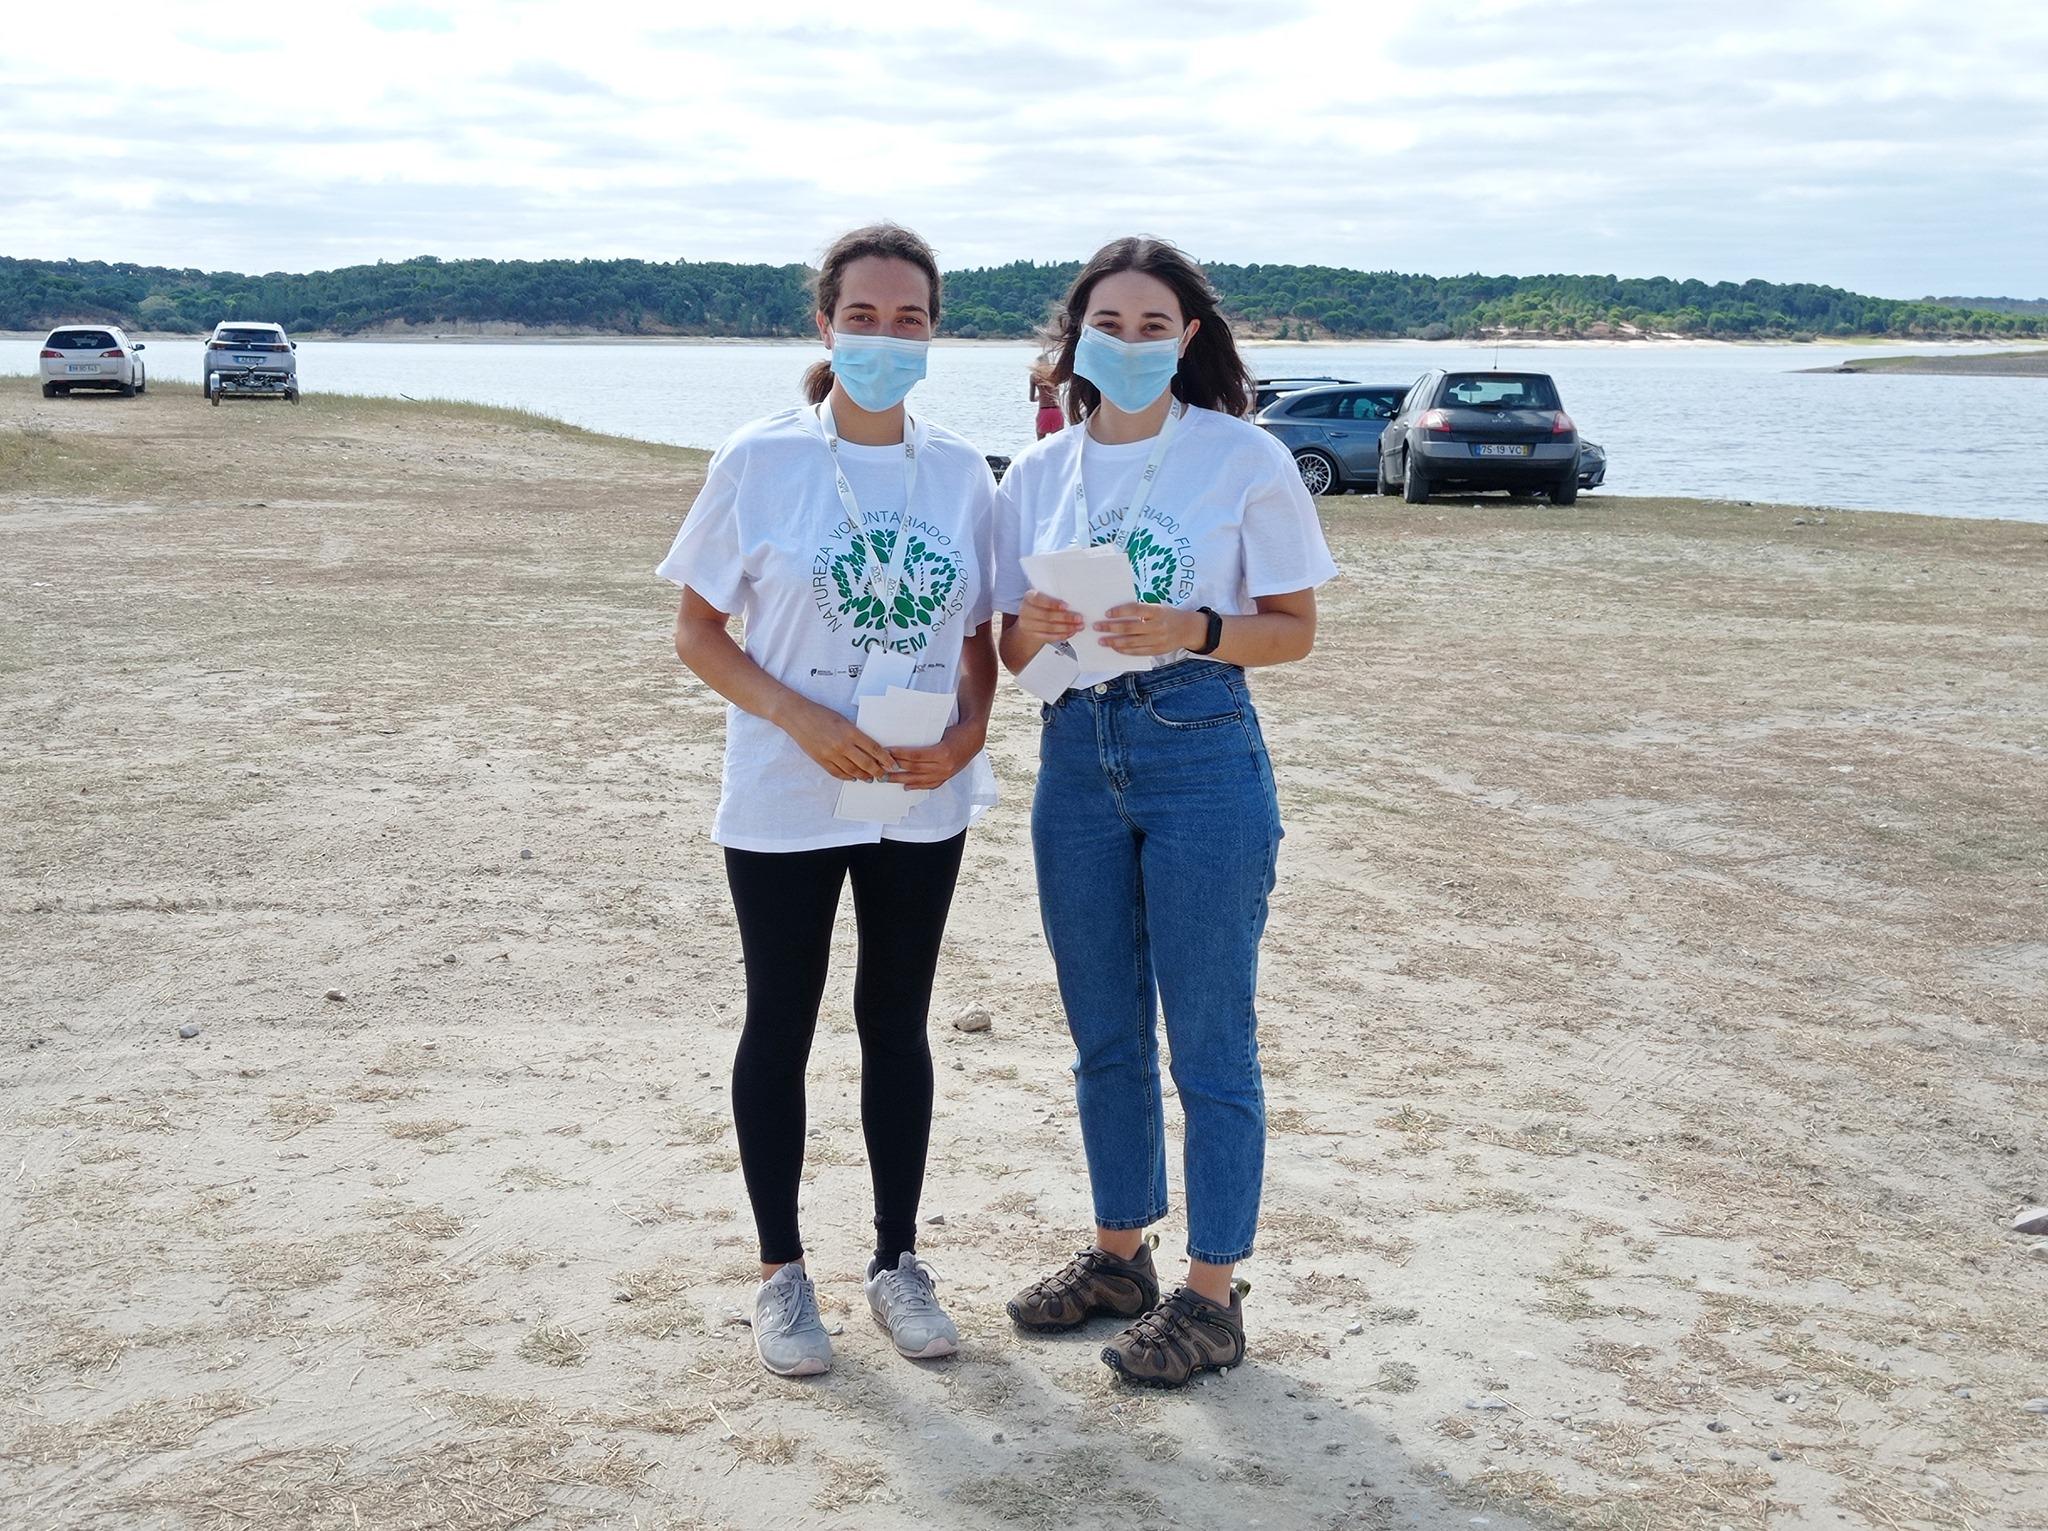 Concluído Voluntariado Jovem para a Natureza e Florestas